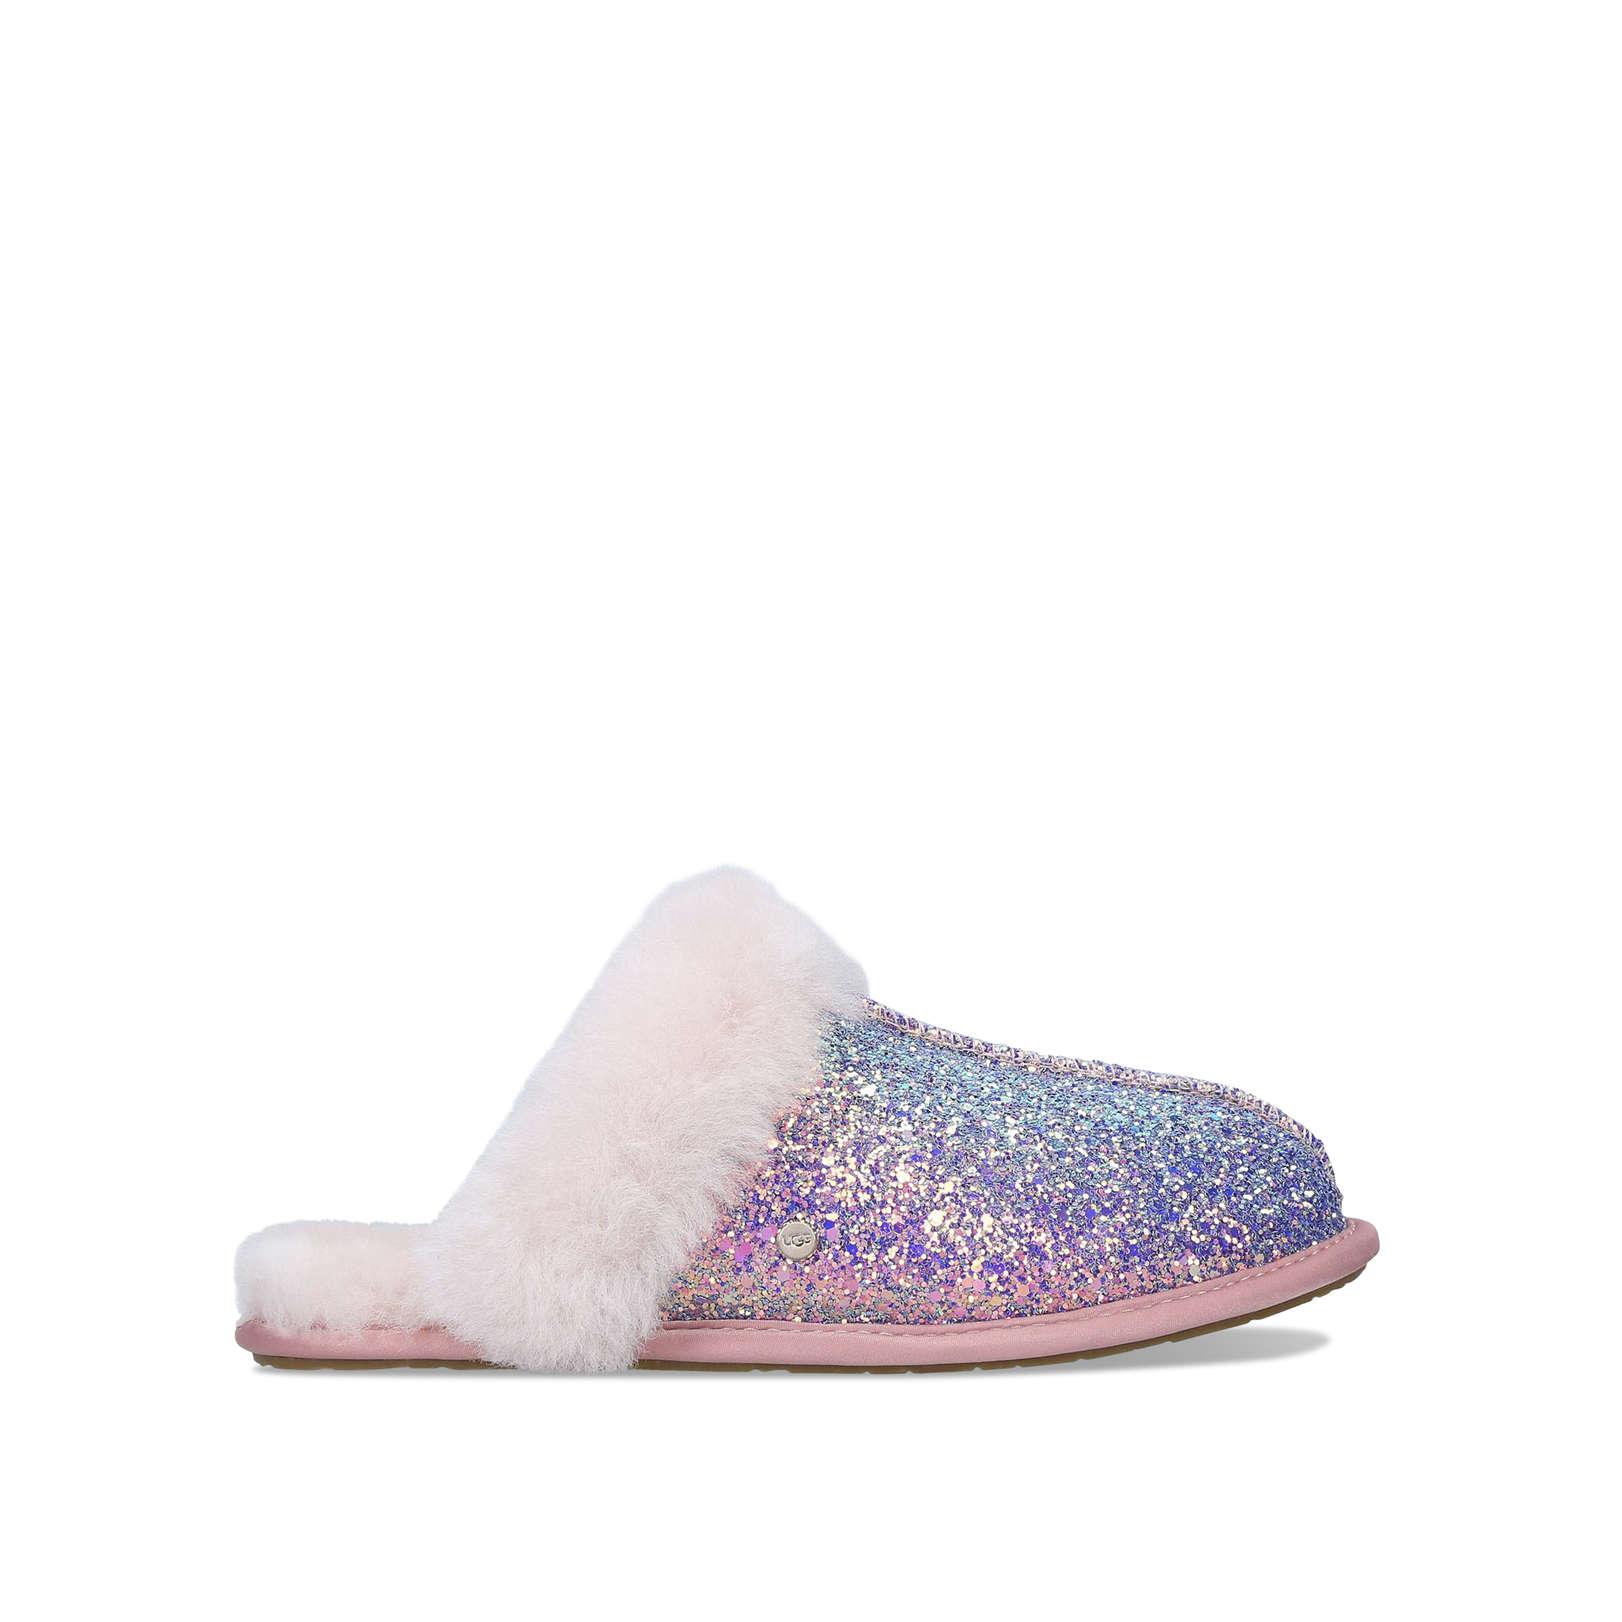 SCUFFETTE II Cosmos - UGG Slippers